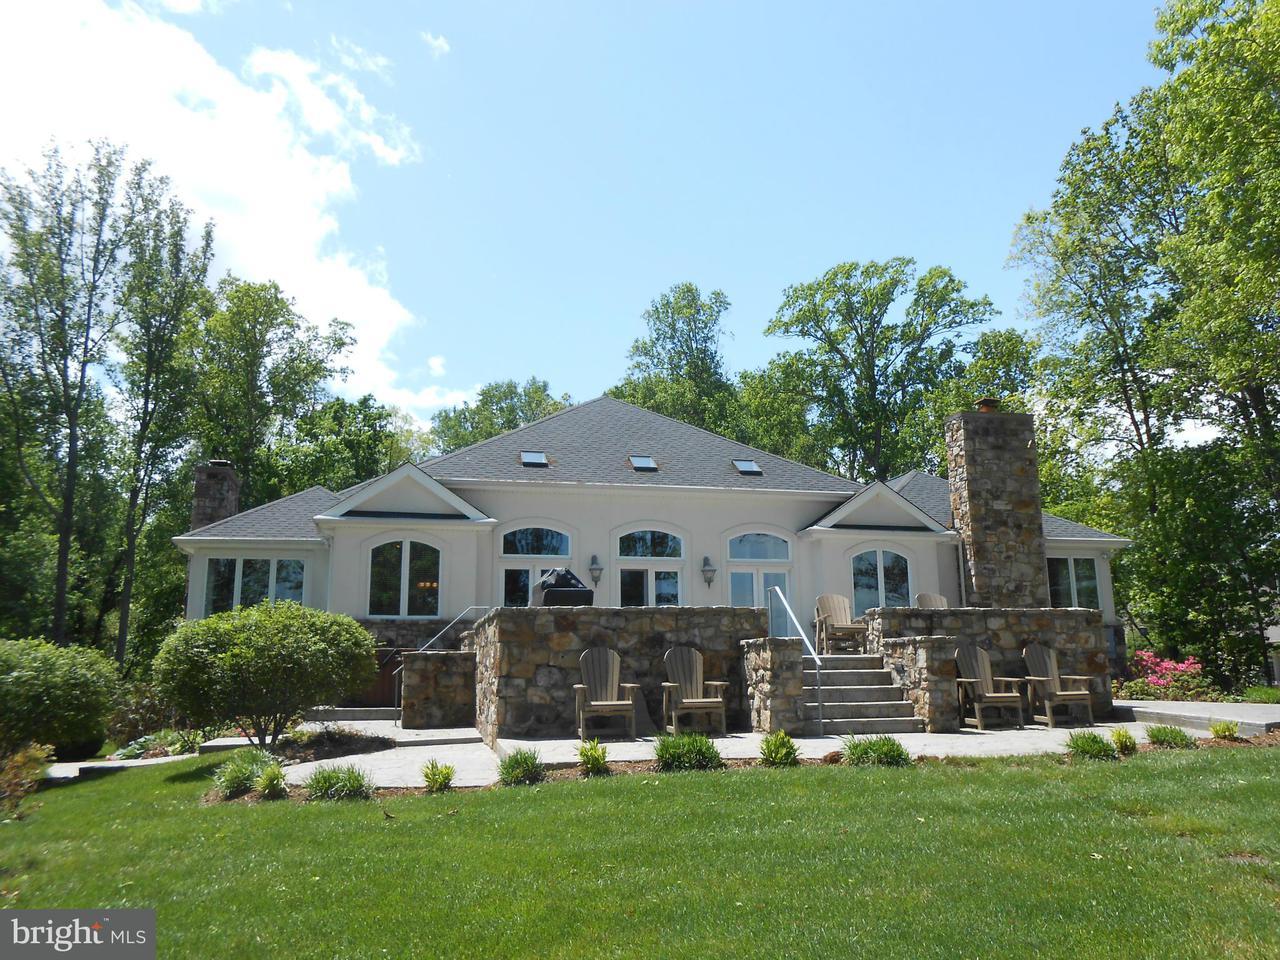 Single Family Home for Sale at 8173 LAKE RILLHURST Road 8173 LAKE RILLHURST Road Culpeper, Virginia 22701 United States